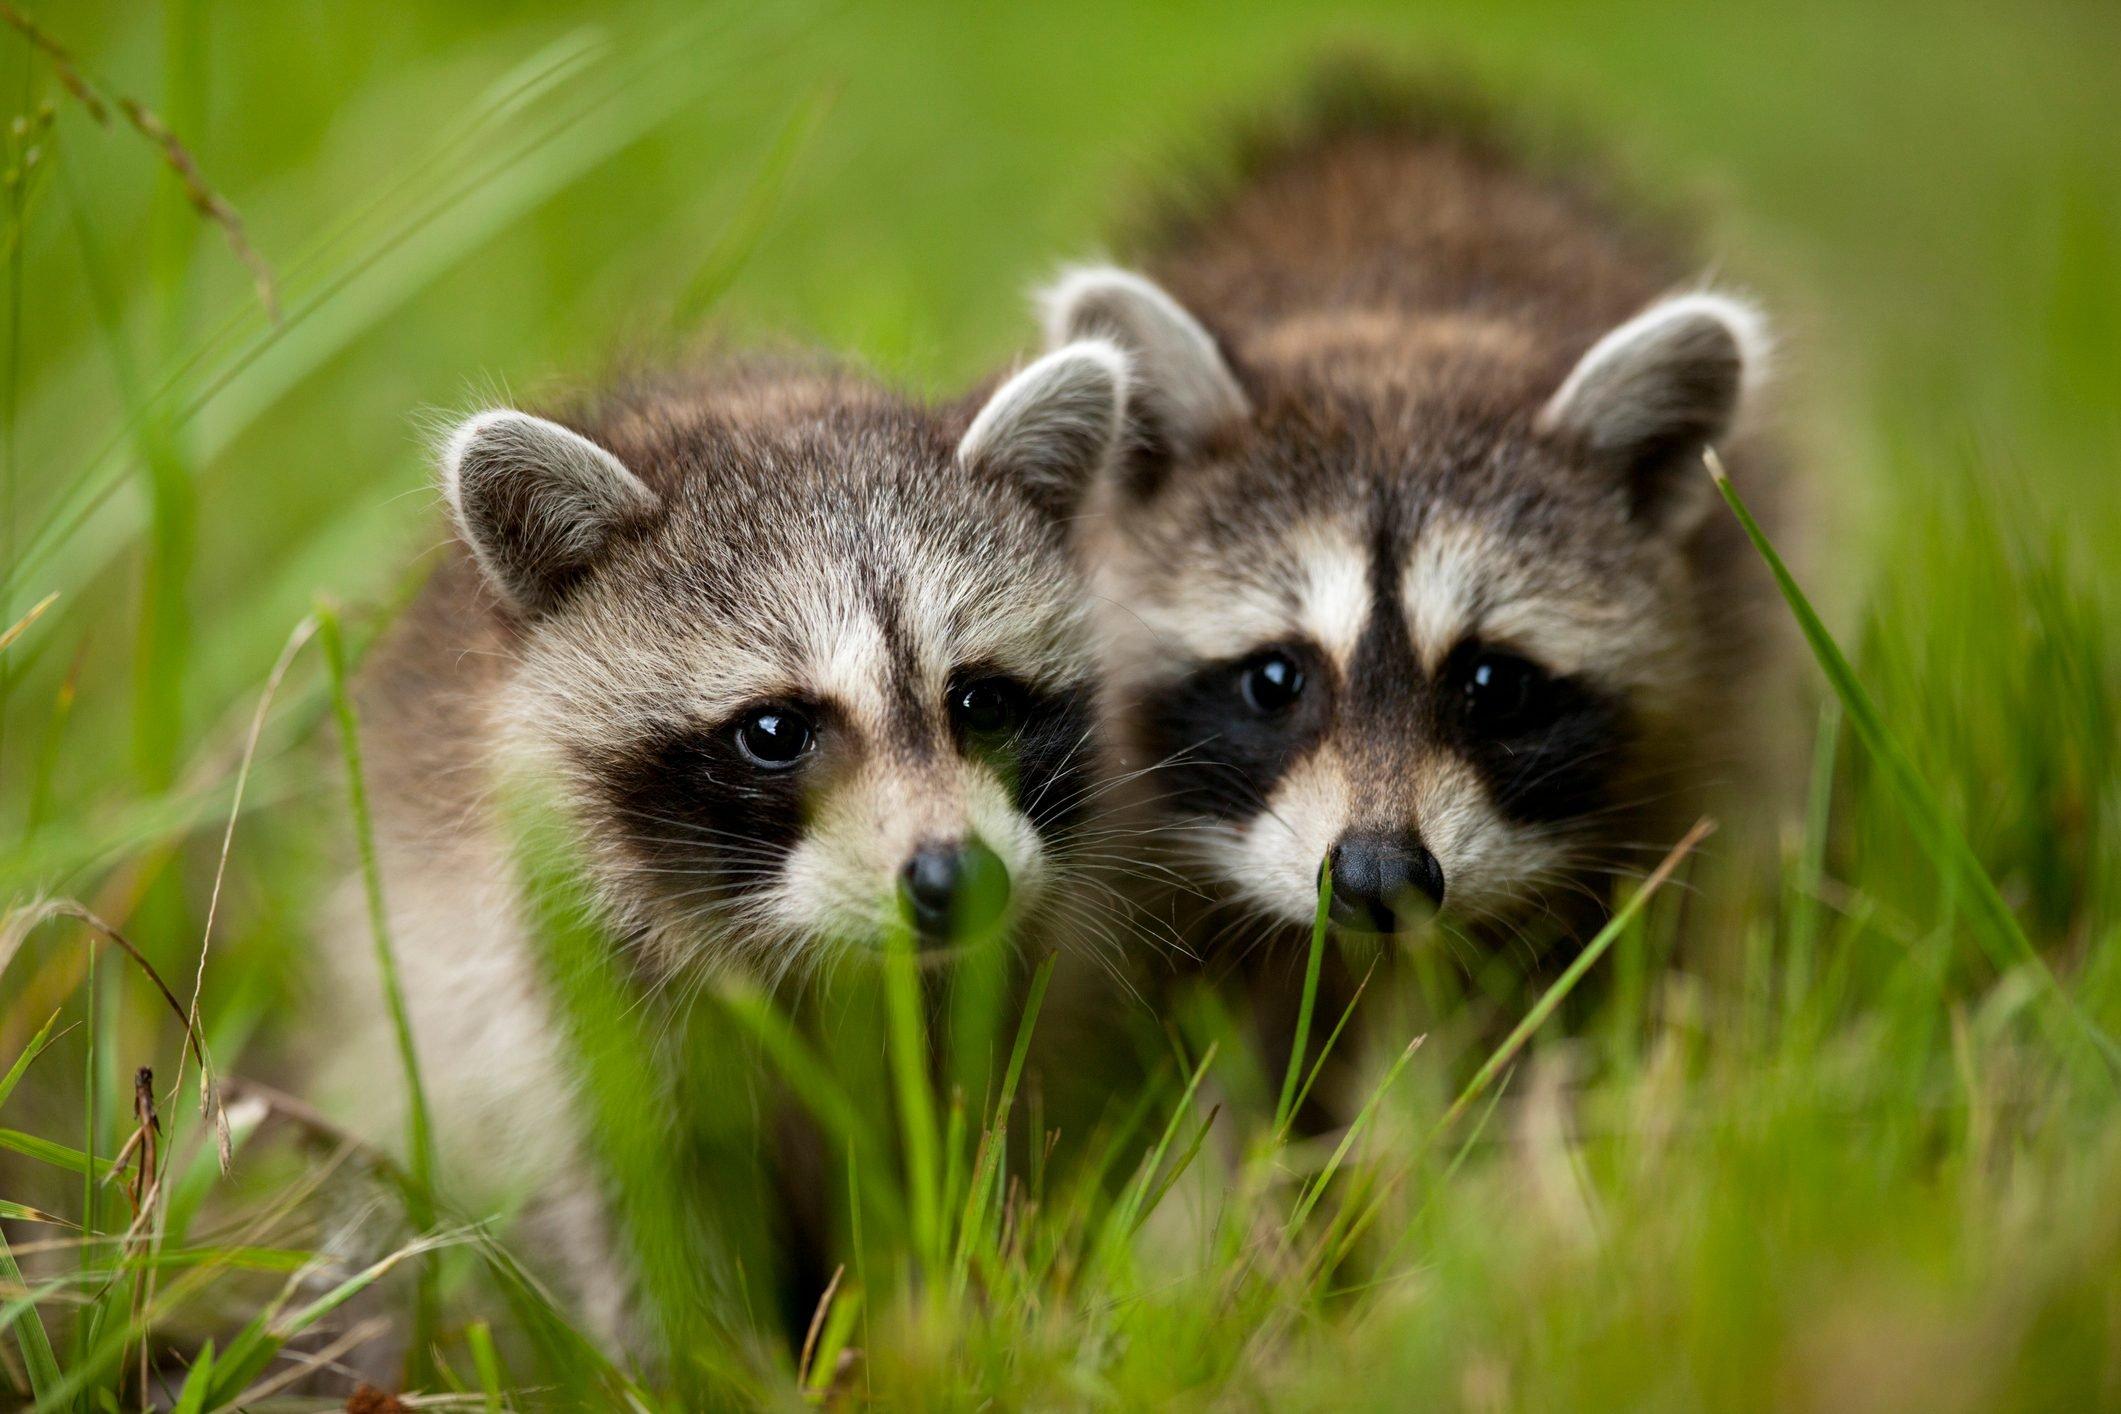 Raccoons at Assateague Island National Seashore in Maryland